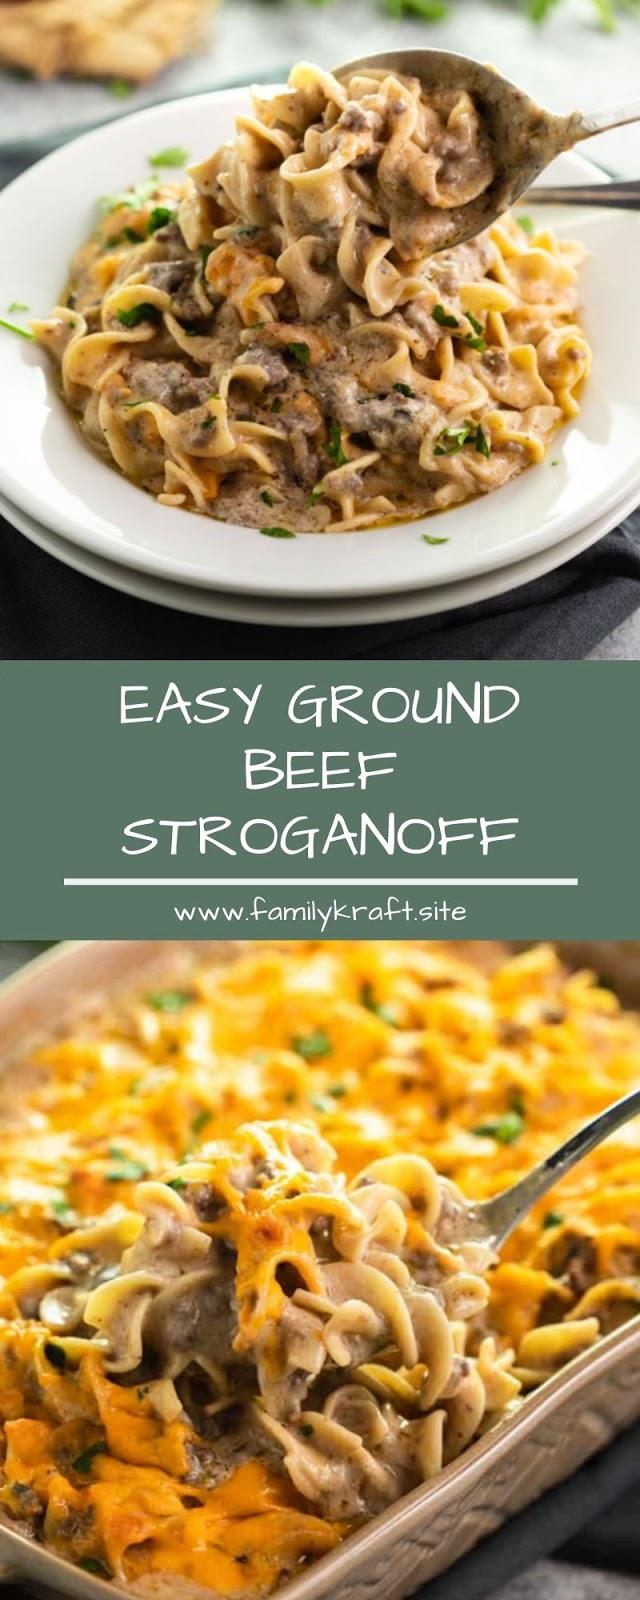 EASY GROUND BEEF STROGANOFF